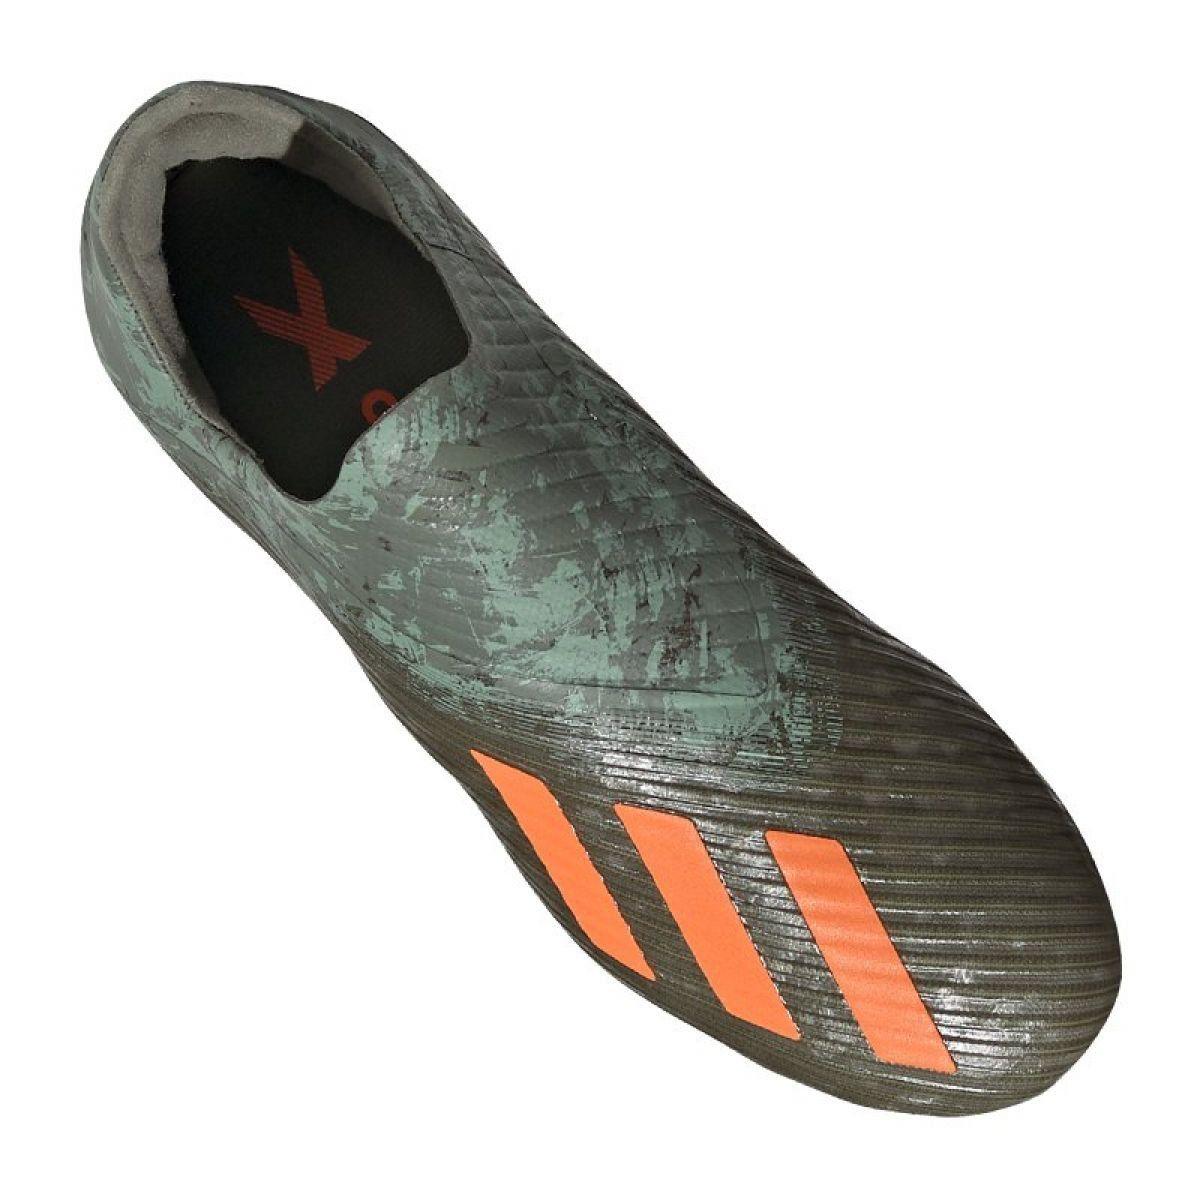 Buty Pilkarskie Adidas Jr X 19 Fg Jr Ef8744 Czarne Czarne Football Shoes Junior Boots Adidas